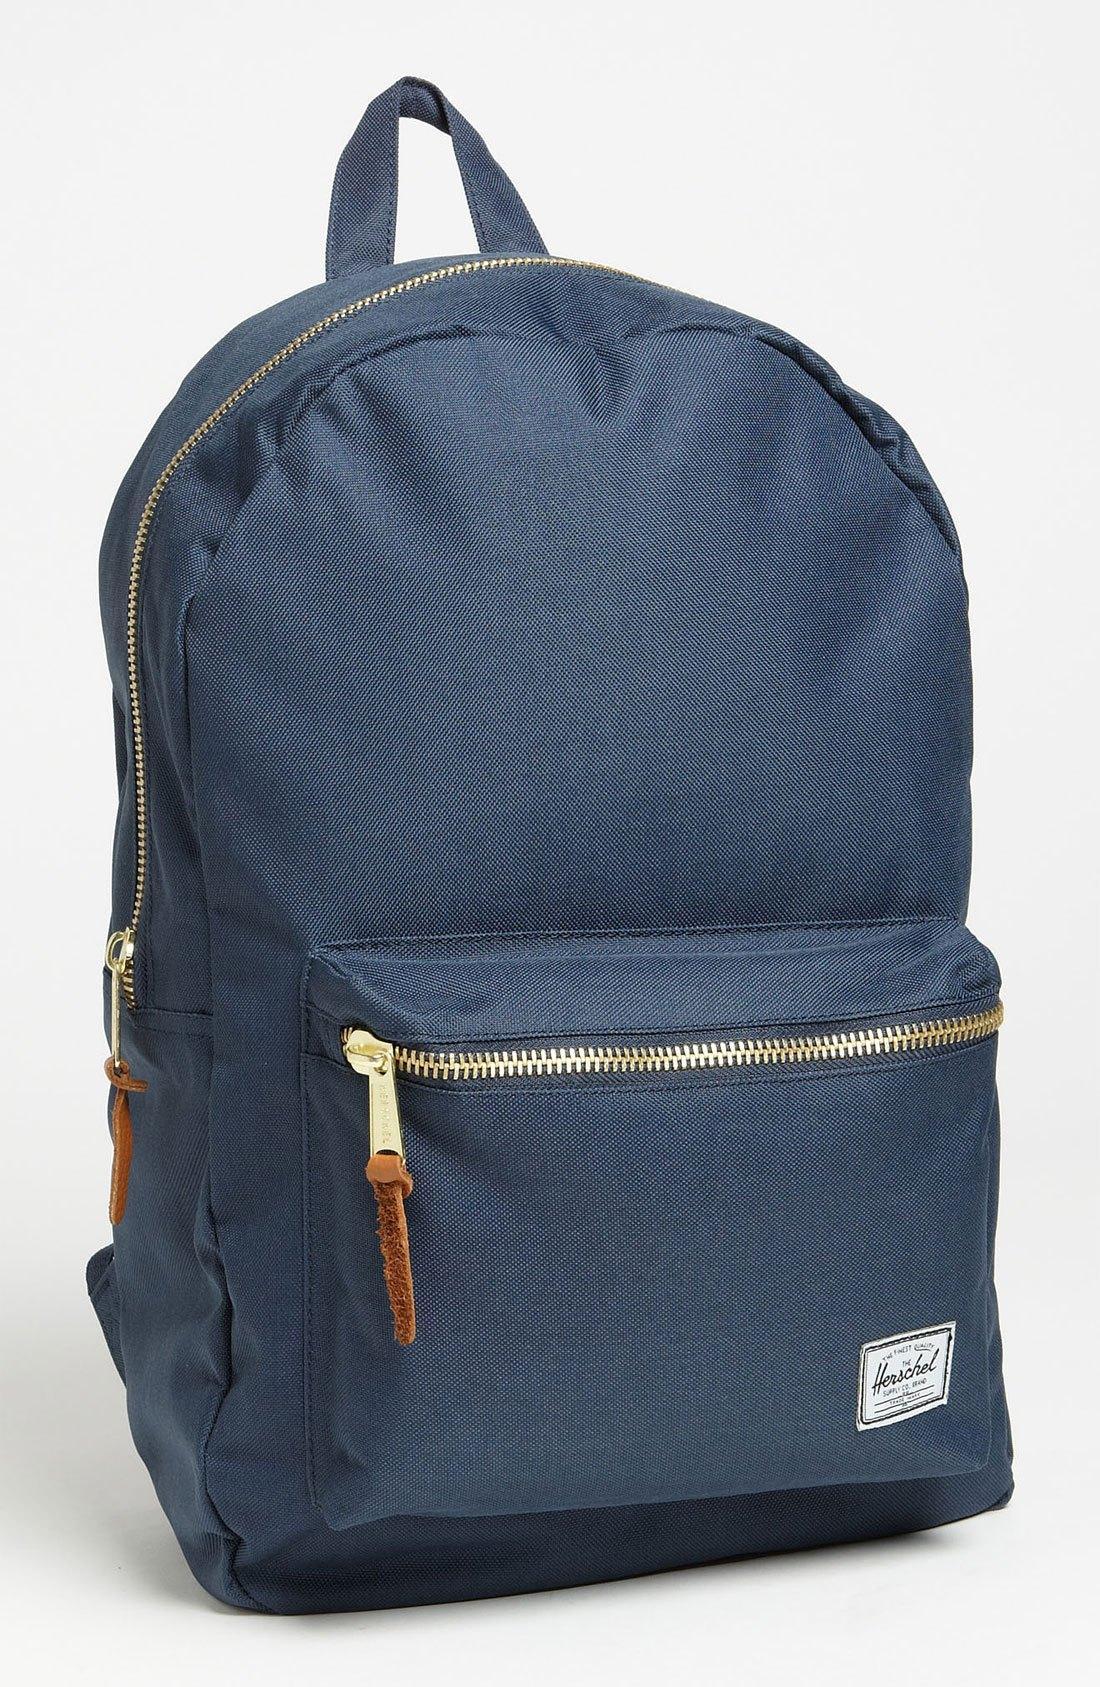 fd9d24f80ec Herschel Supply Co. Settlement Backpack - Blue In Navy  Red